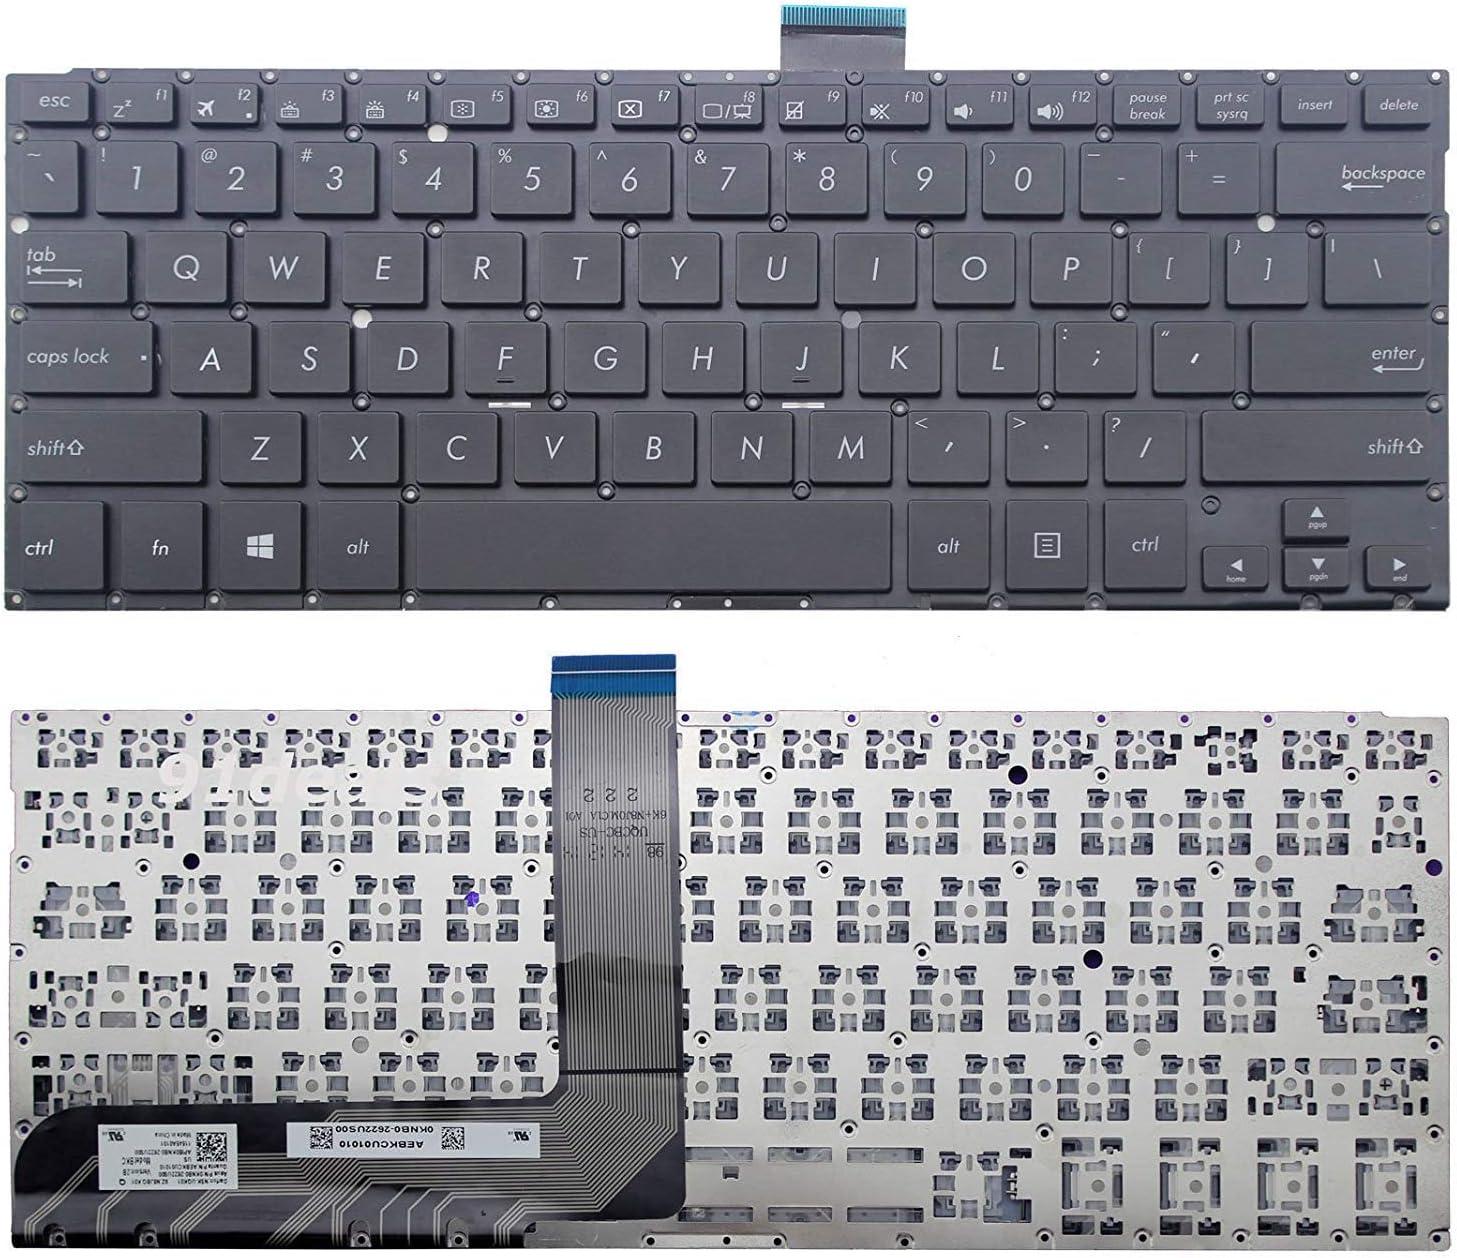 Original New Laptop Replacement US Black Keyboard for Asus TP301UJ TP300 TP300L TP300LD TP300LJ TP300UA NSK-UQK01 No Frame